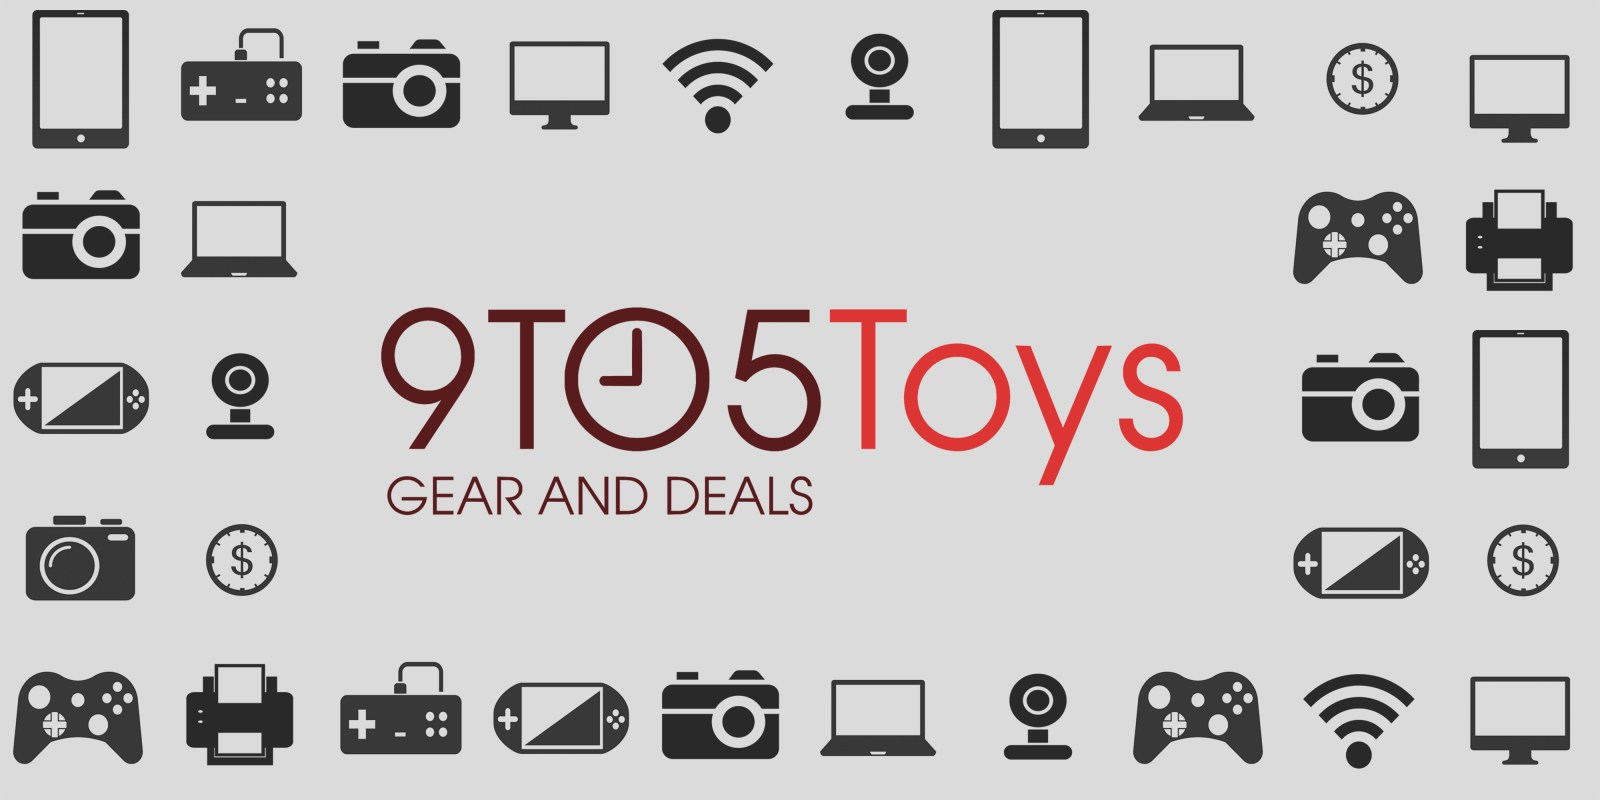 9to5Toys Last Call: BeatsX $100, Apple 13-inch 256GB MacBook Air $920, Logitech K480 Keyboard $23, more